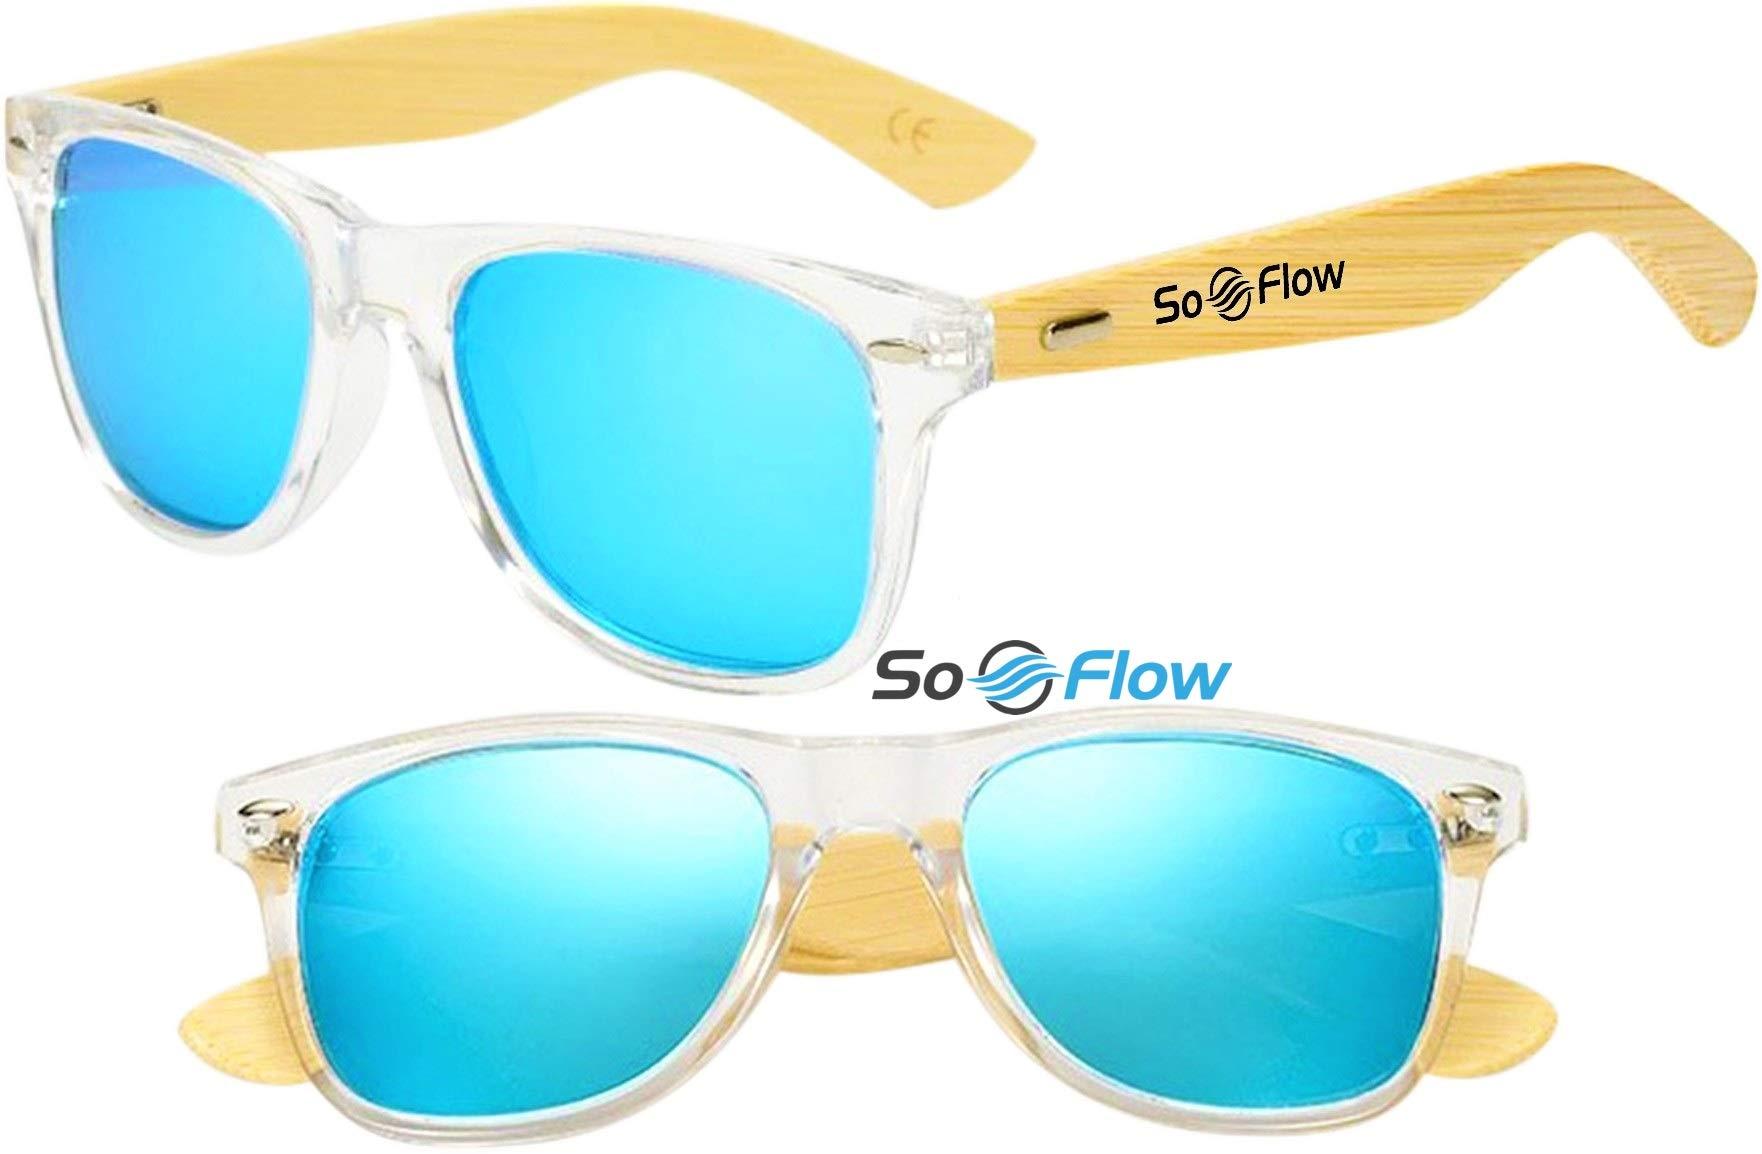 SoFlow Neon Blue Polarized Wood Sunglasses Men Women Mirrored Lightweight Wooden Bamboo Wayfarer UV-400 Clear Front Frame Medium/Large Blue Lens Sunglasses Prime Cool Beach Pool Driving Shades